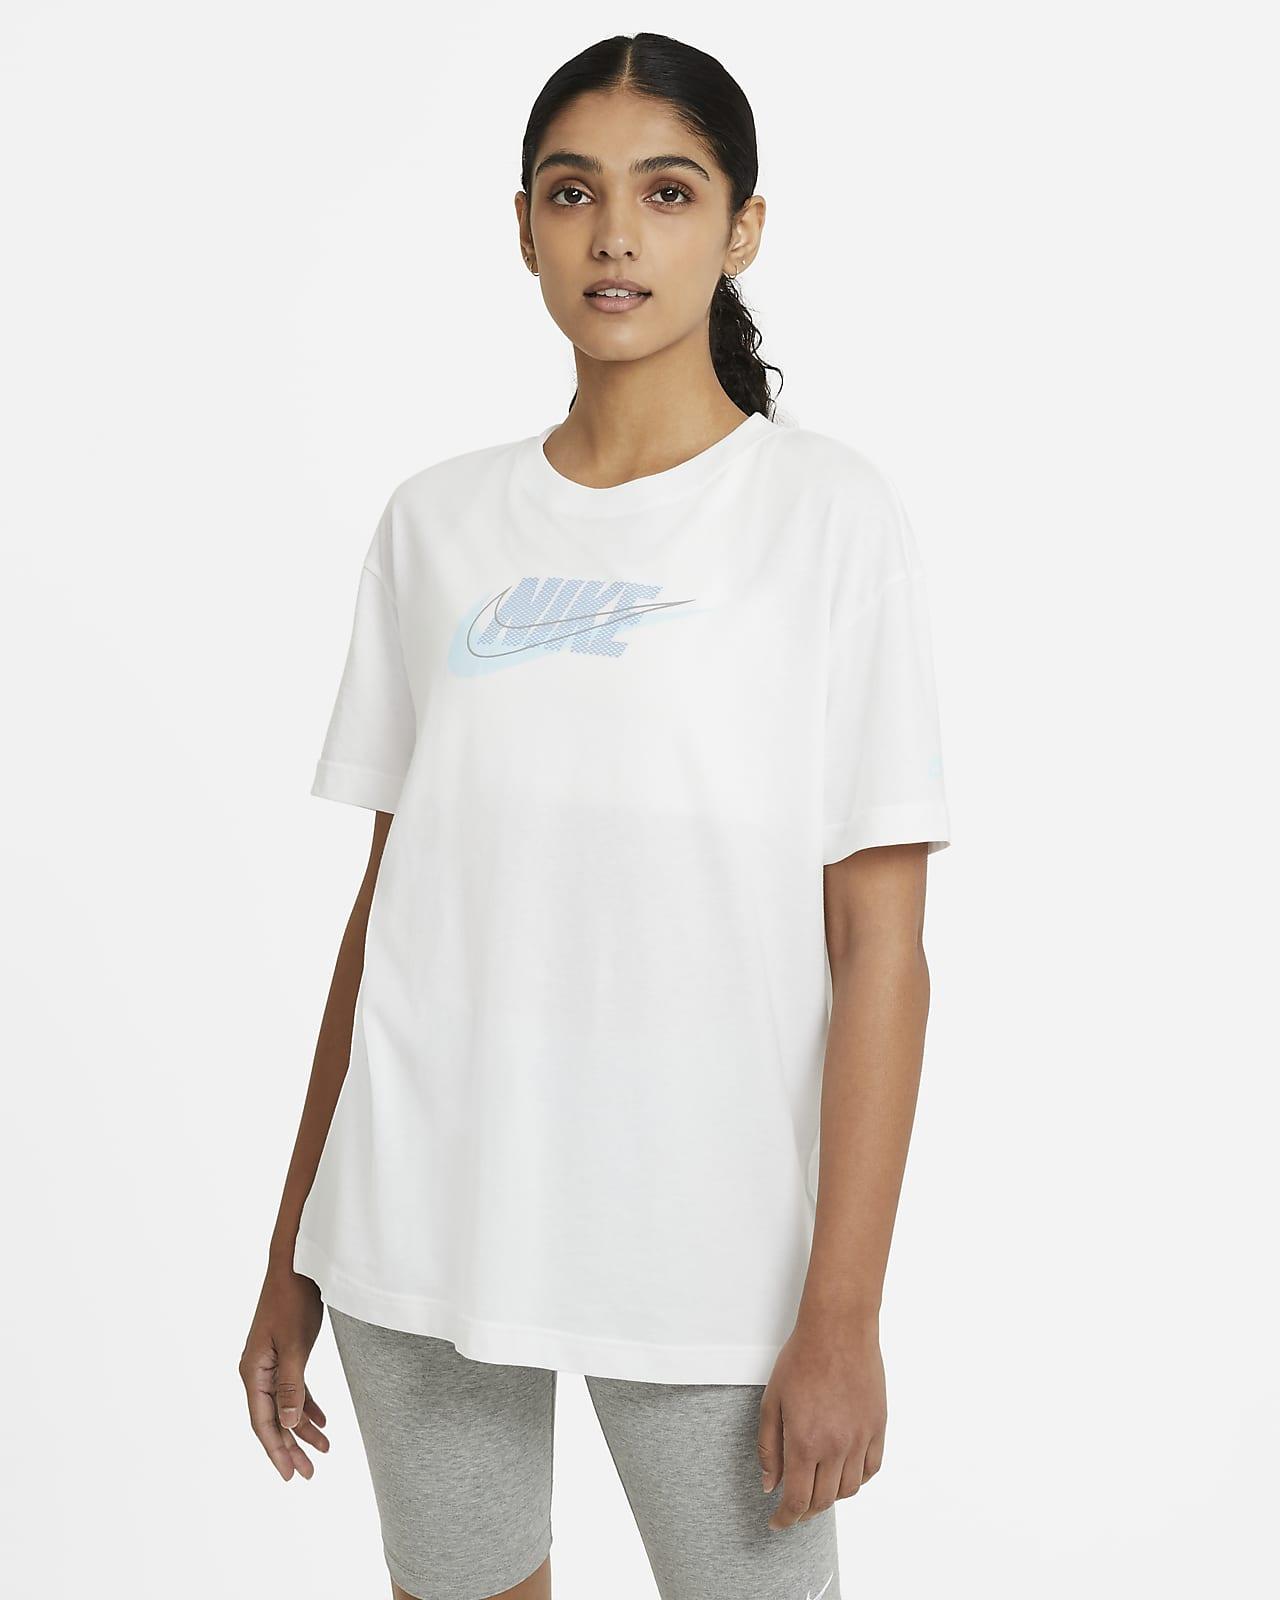 Tee-shirt Nike Sportswear pour Femme